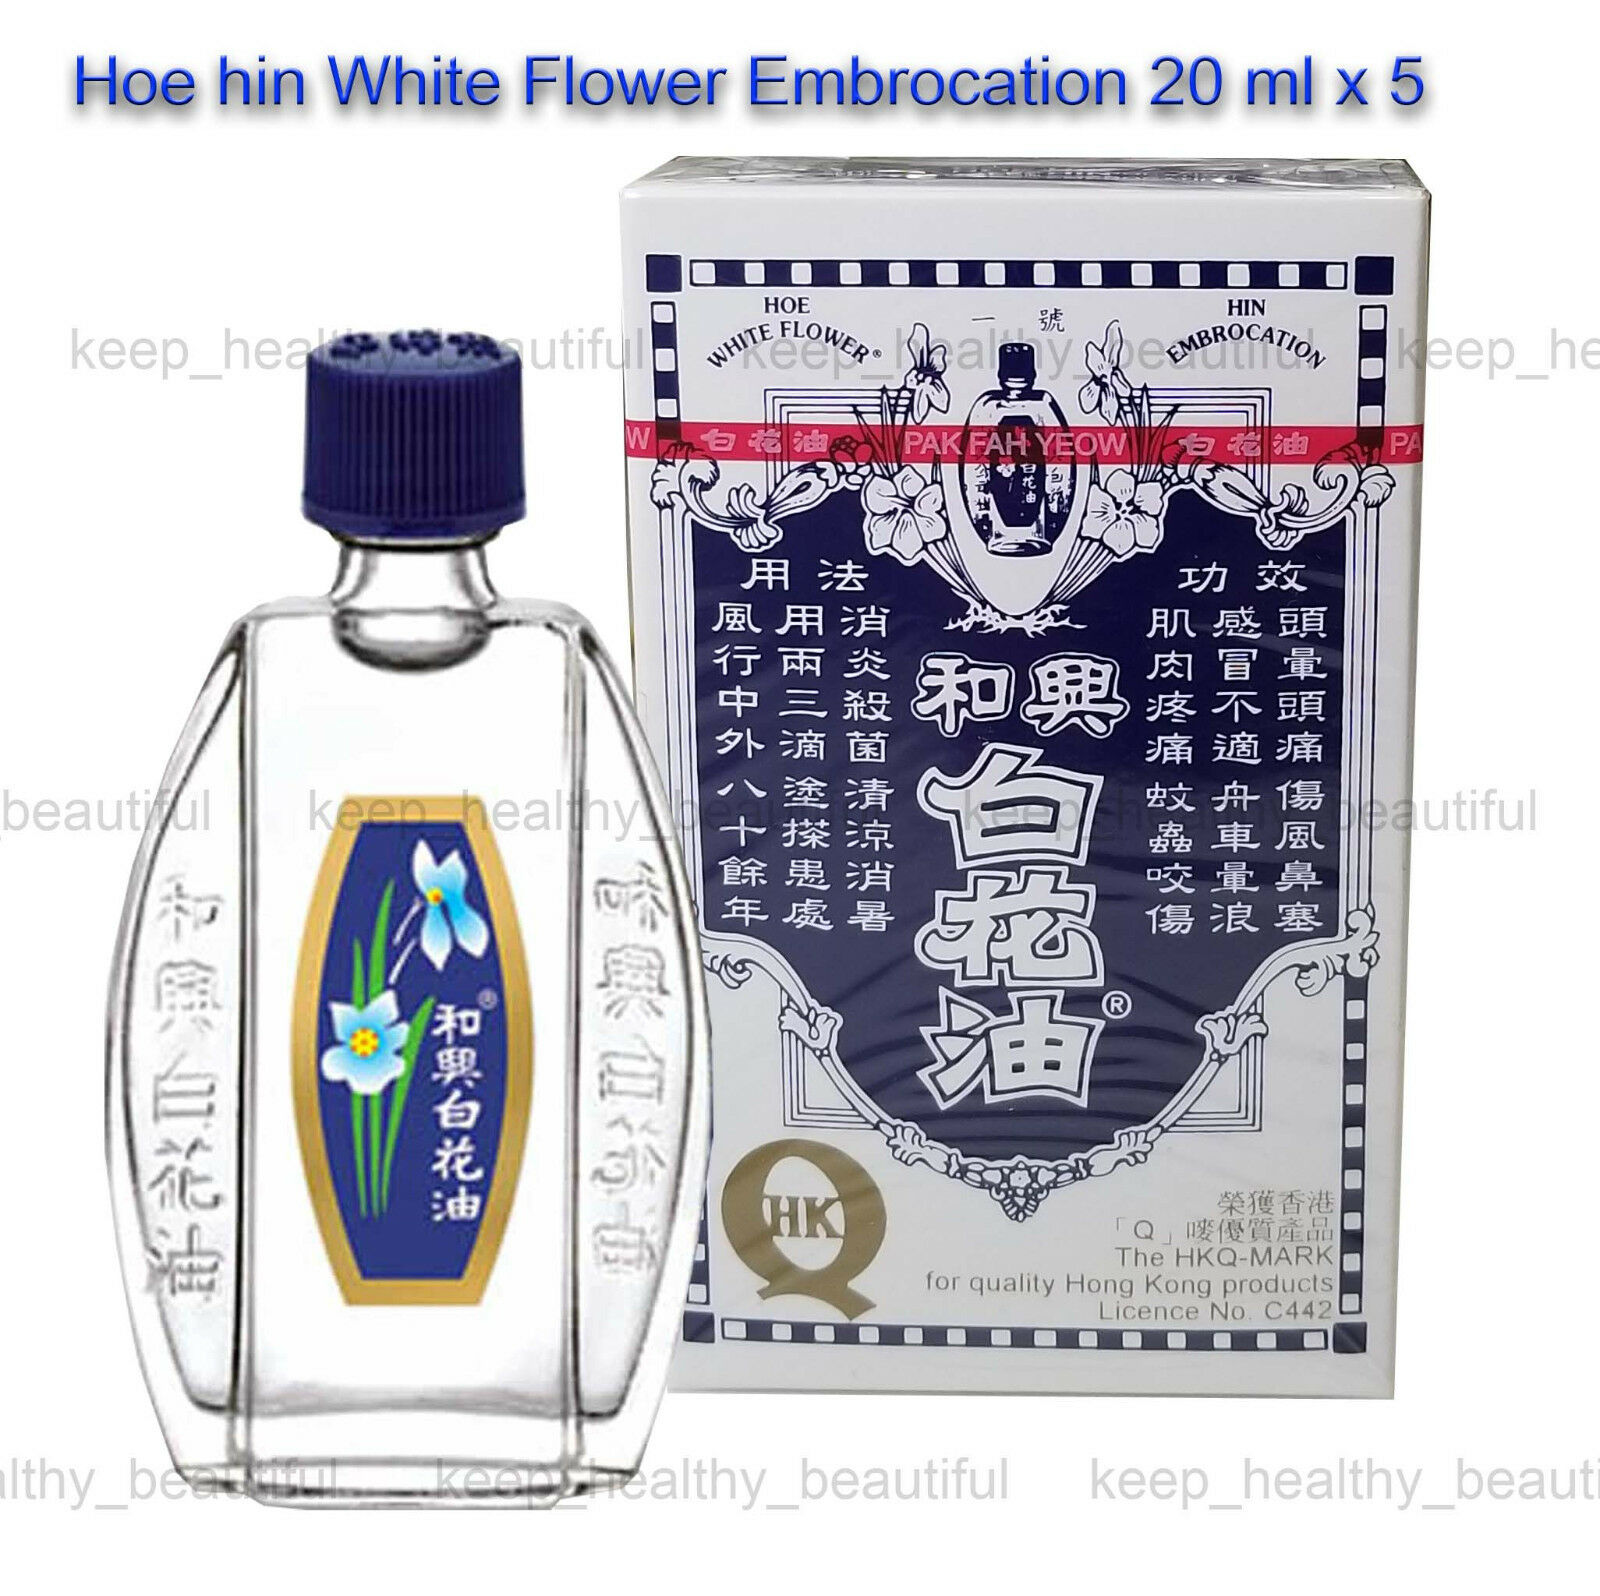 Hoe Hin White Flower Embrocation 20ml X 5 Registered Post Tracking